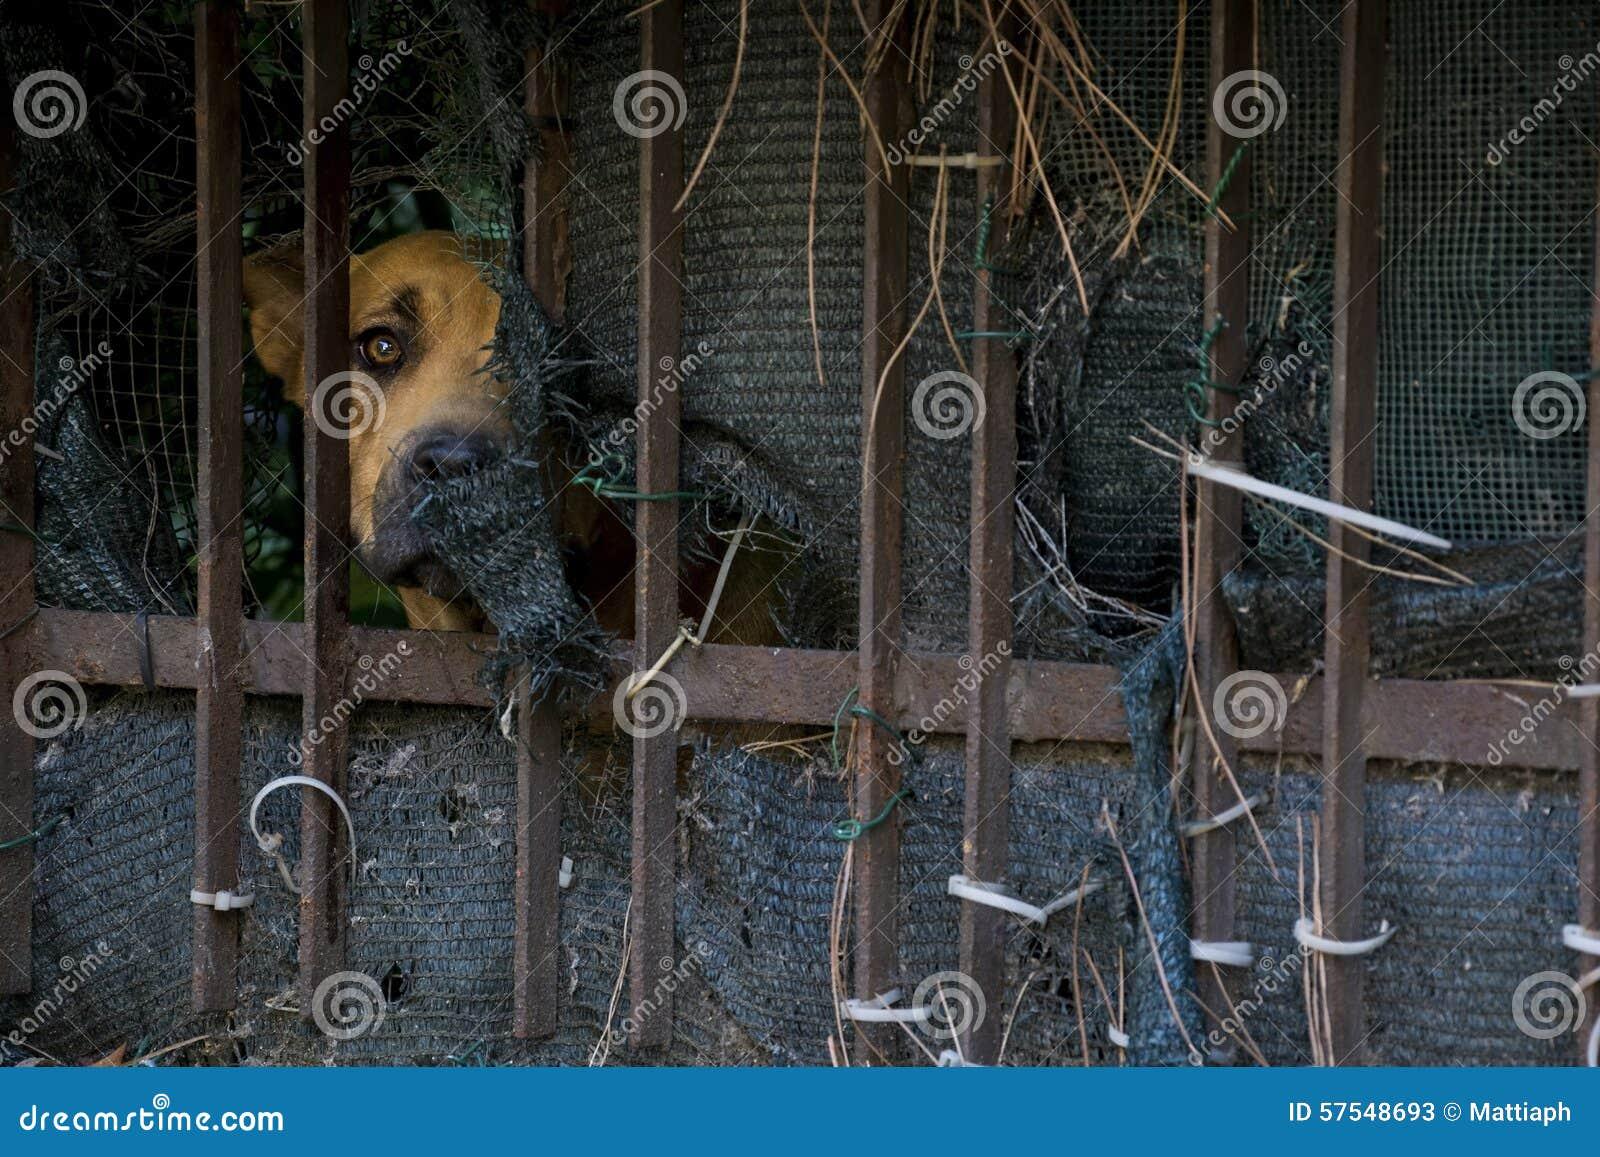 Bak Hundstaket Arkivfoto - Bild: 57548693